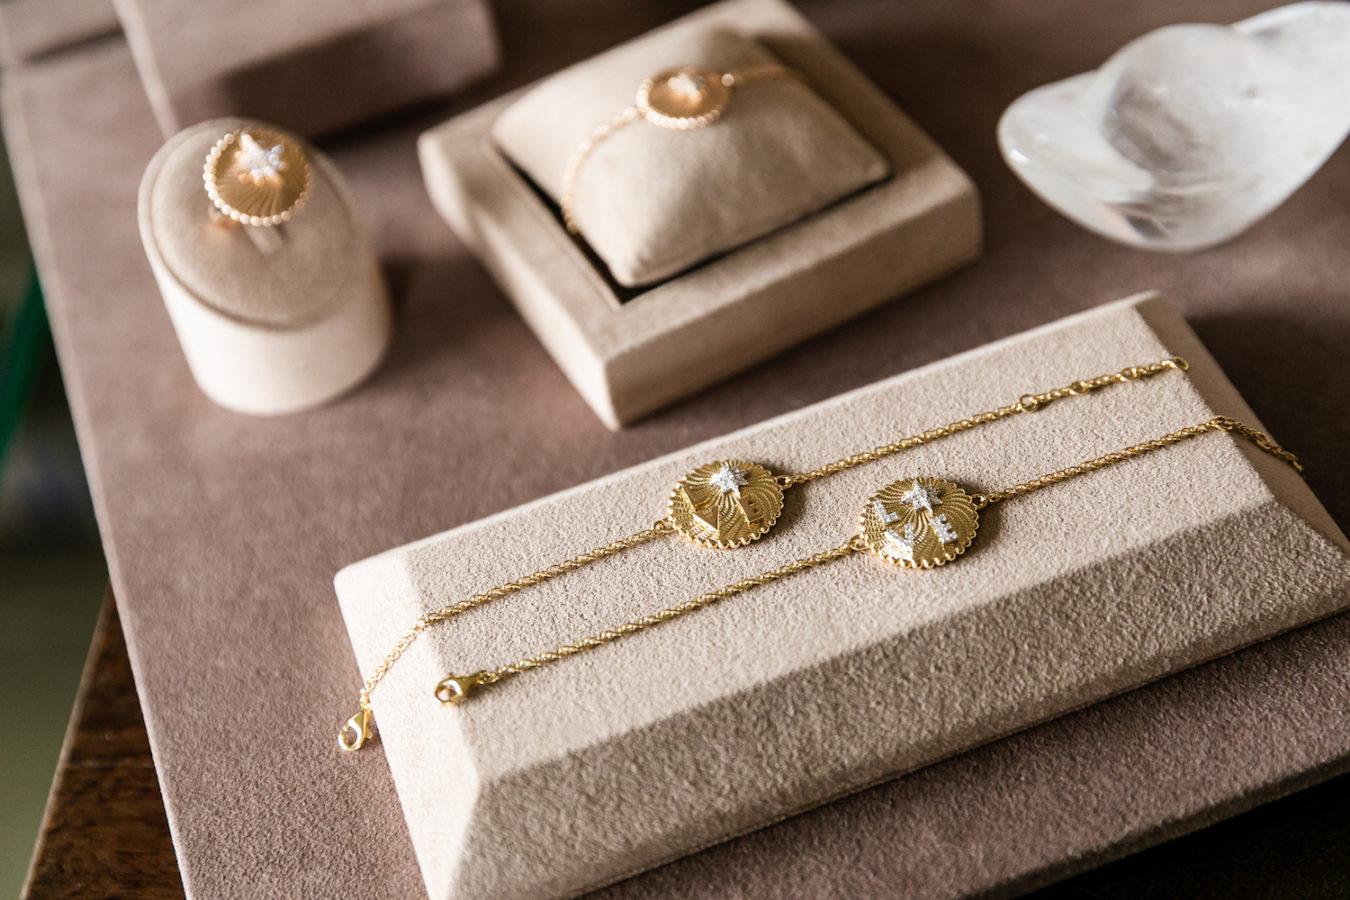 #PrestigeRecap: Adage Jewelry Unveils New High-End Jewellery Collections